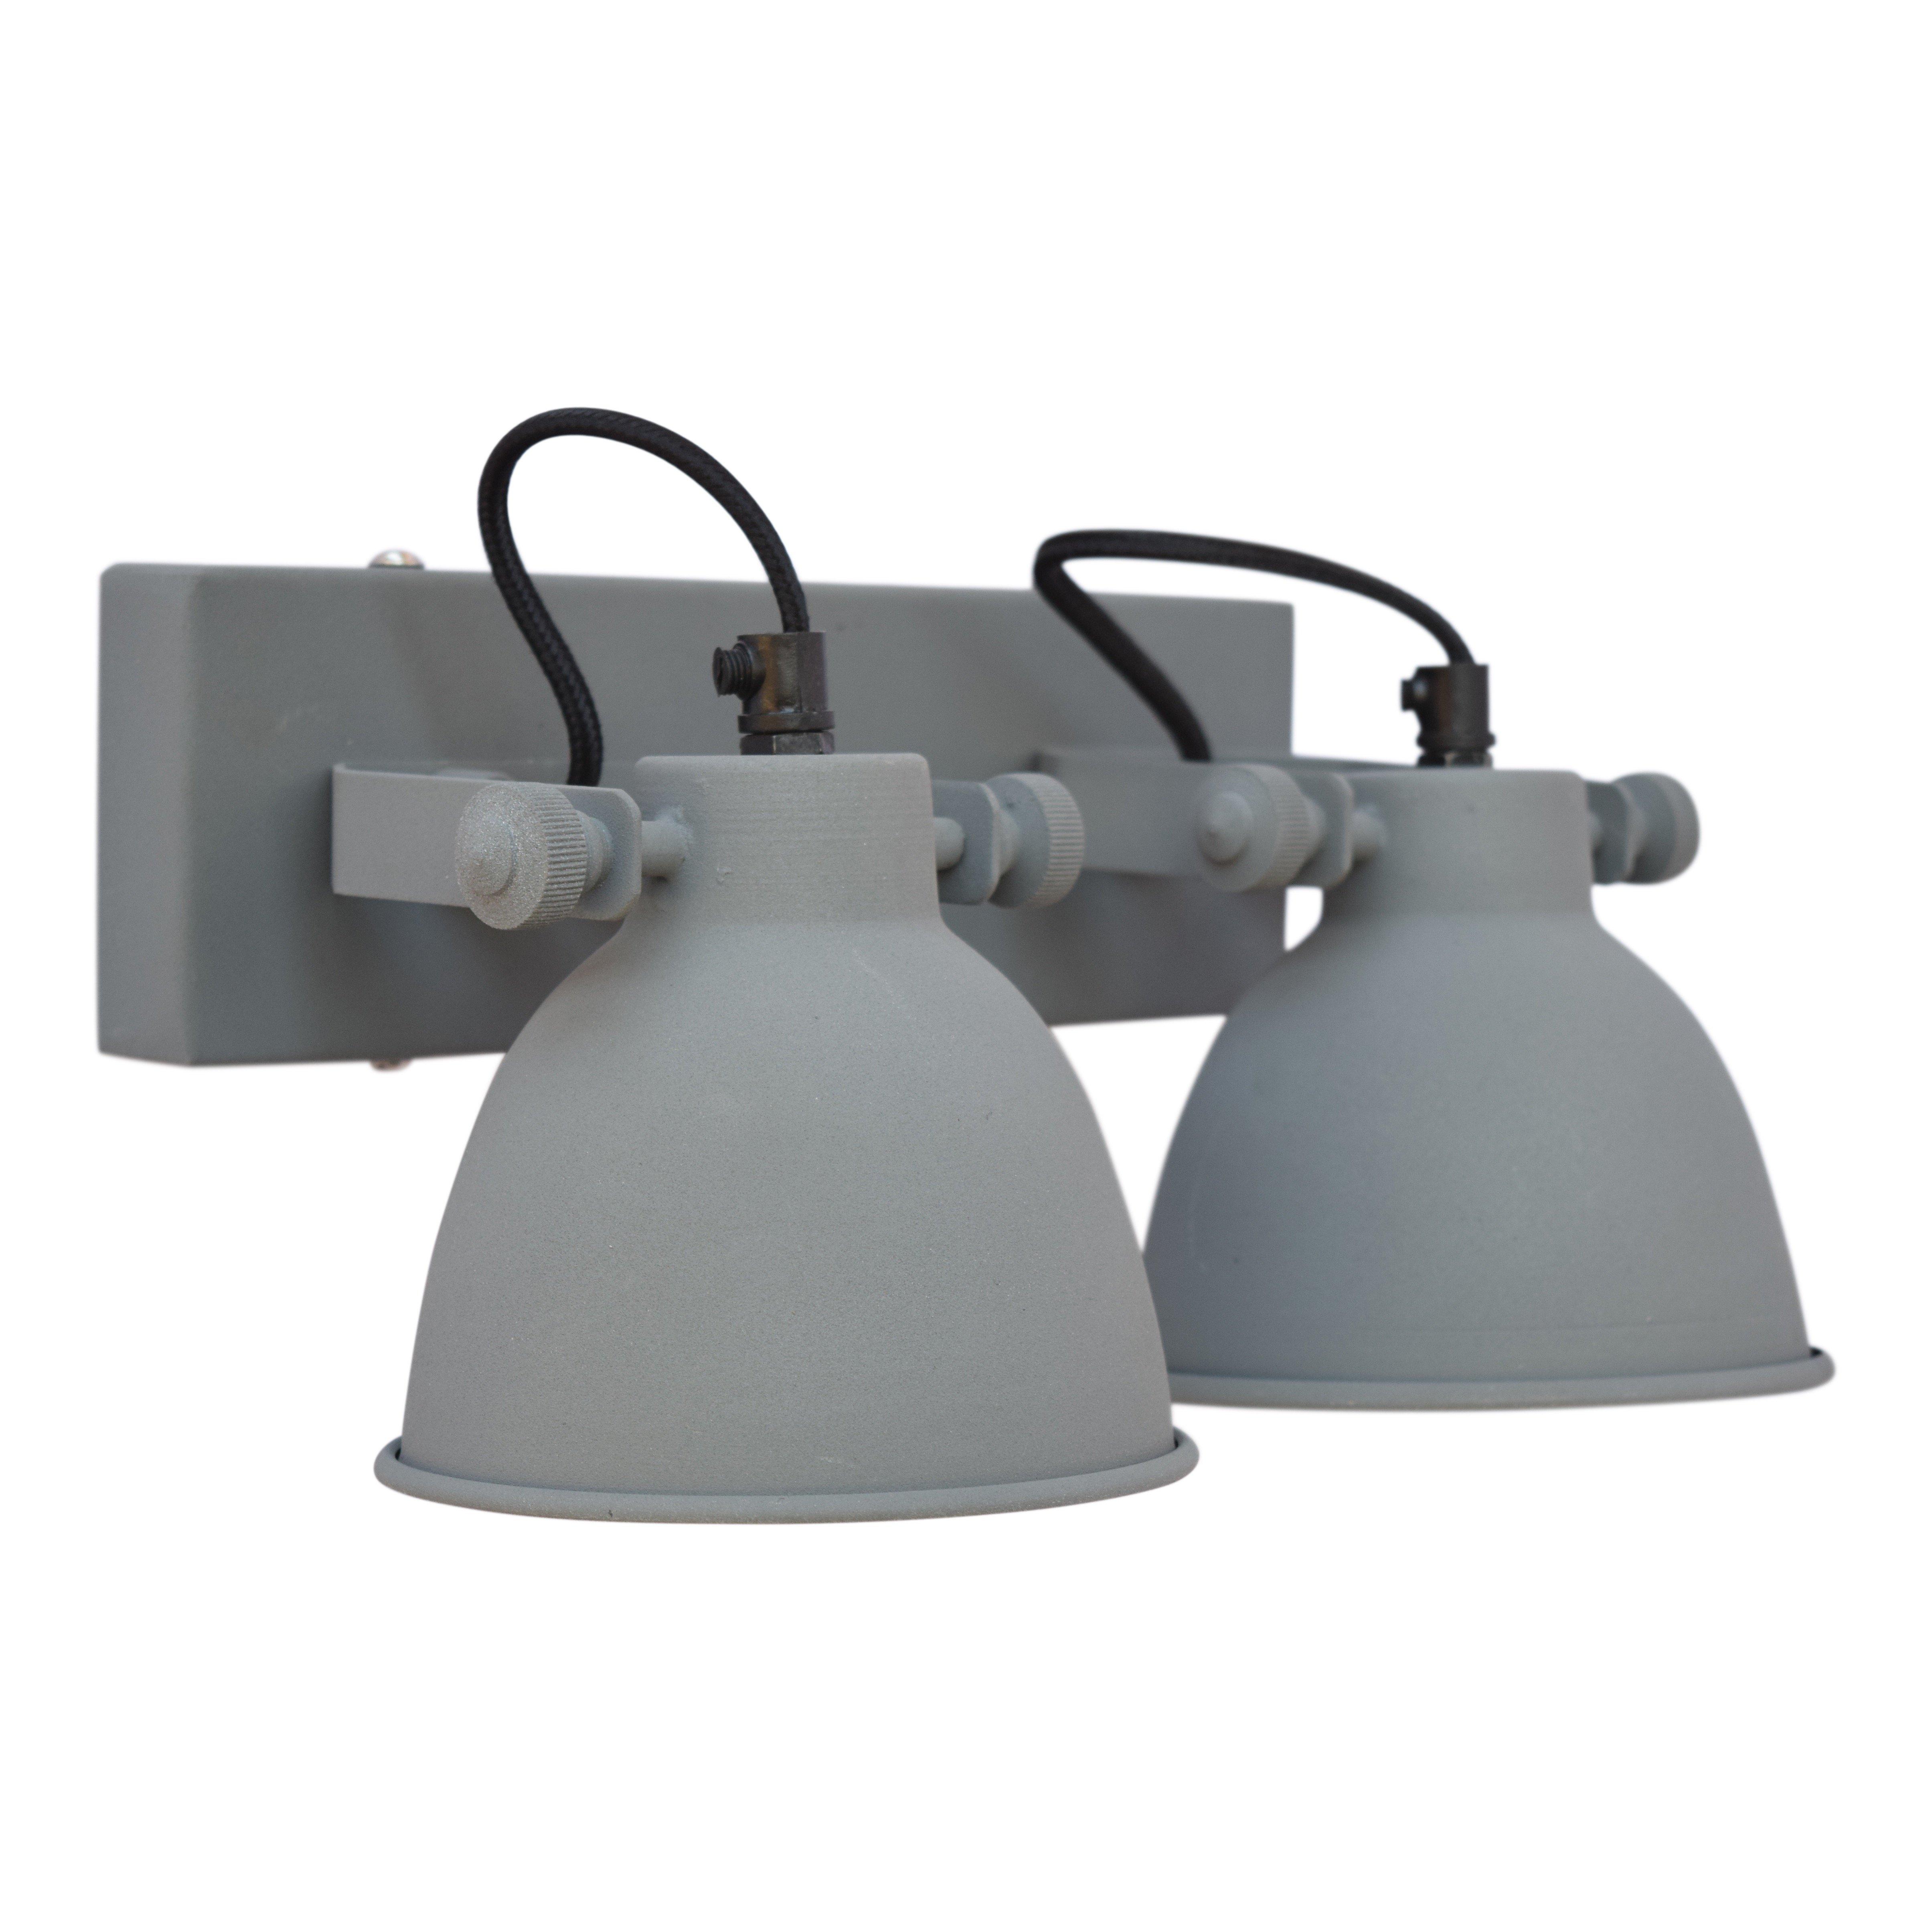 Urban Interiors Wandlamp Double Vintage grijs Ur. AI-WL-DBL-21-VG